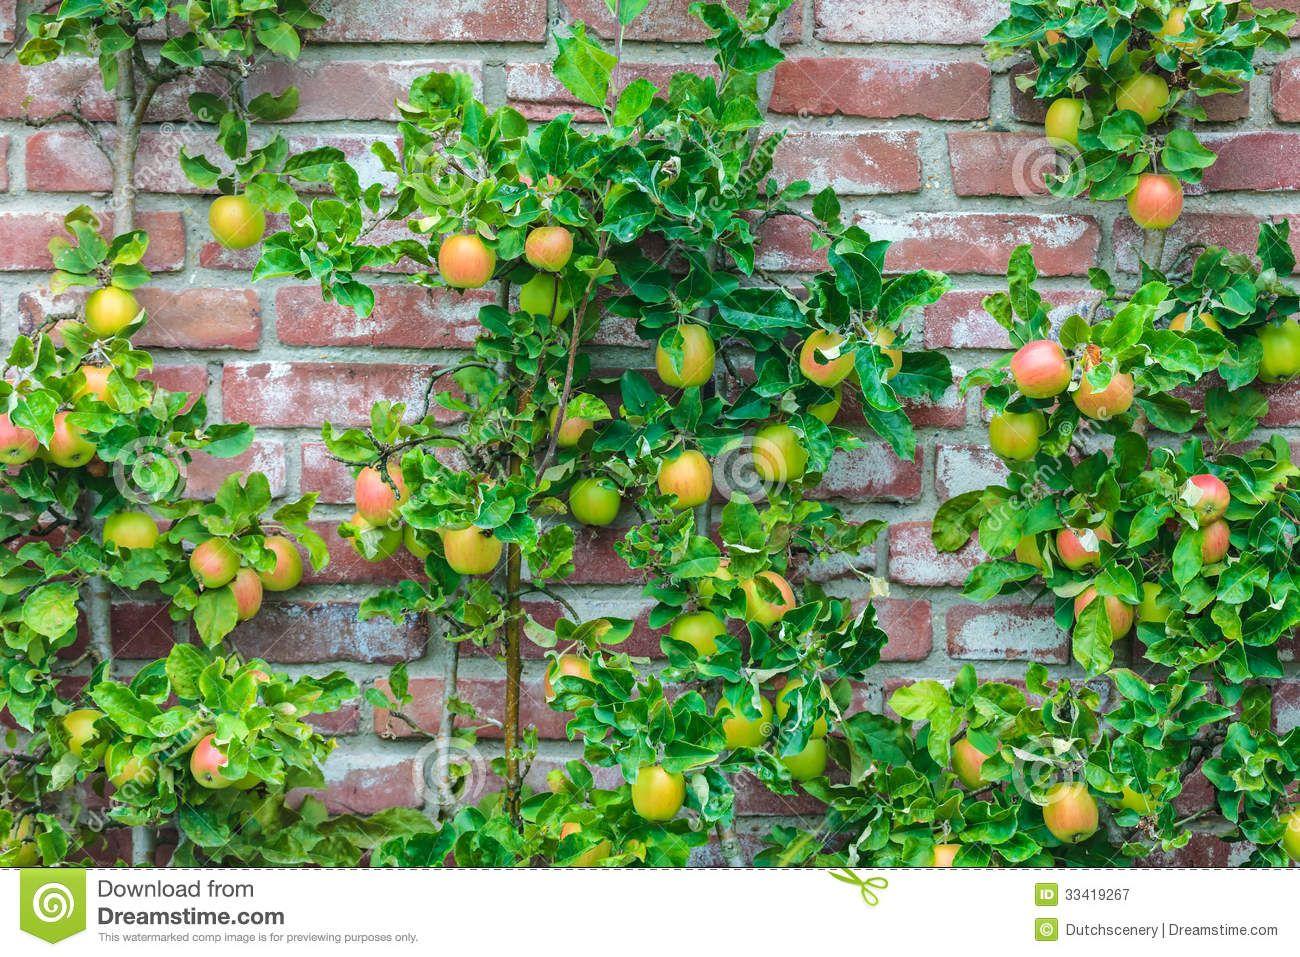 Edible plants fruit trees growing fruit trees